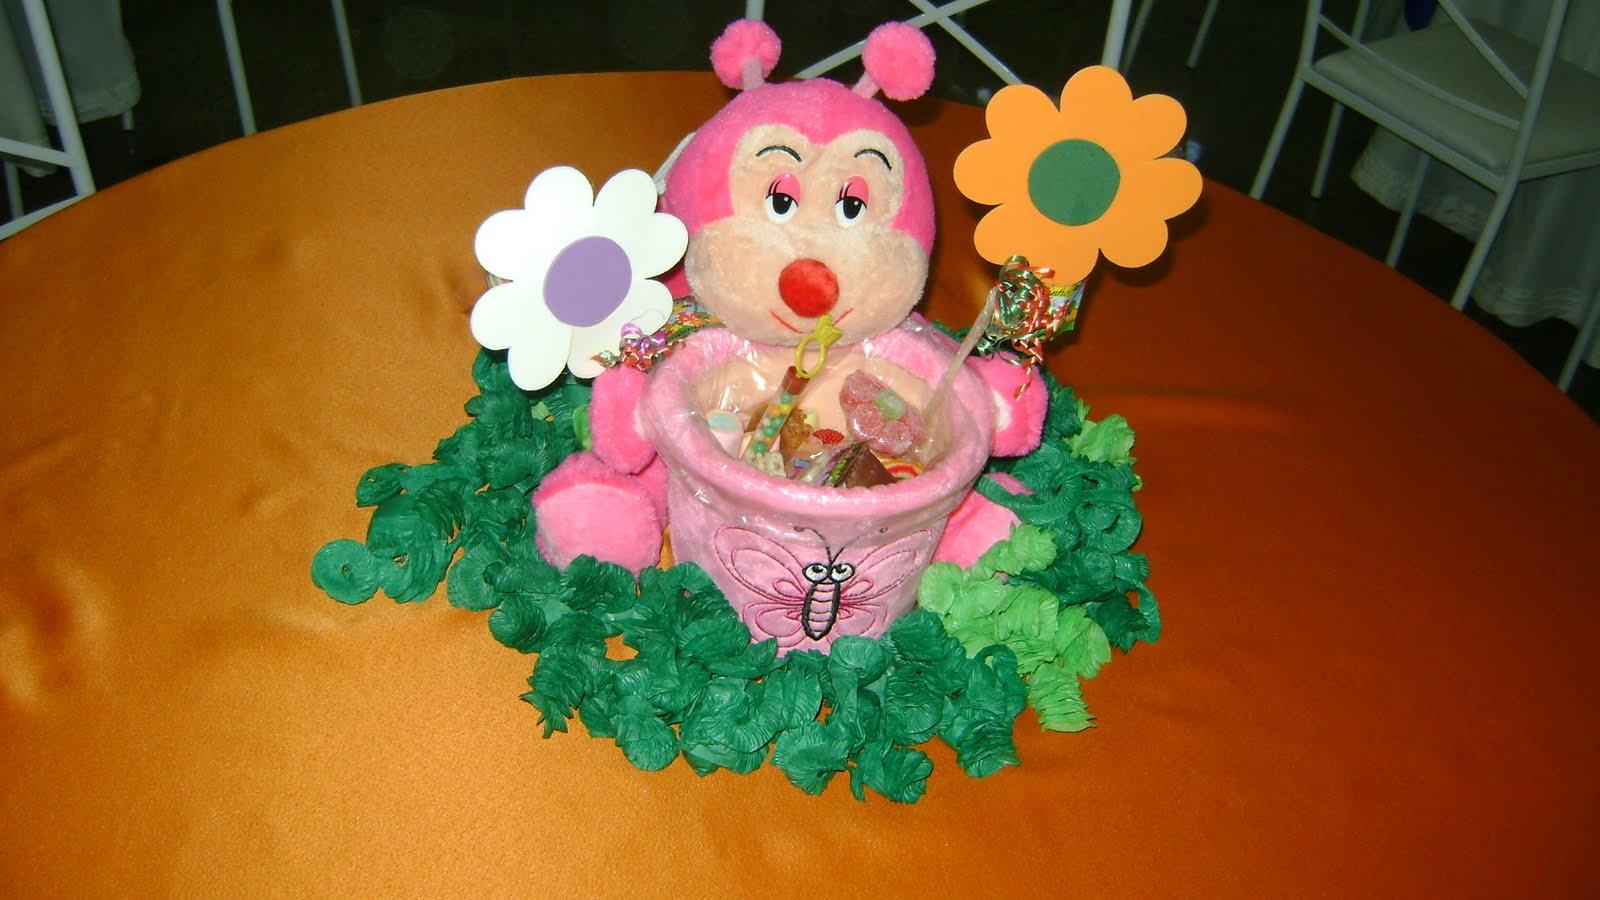 enfeite de mesa aniversario jardim encantado: ENFEITES INFANTIS: Enfeite de Mesa – Tema Jardim Encantado – R$ 45,00